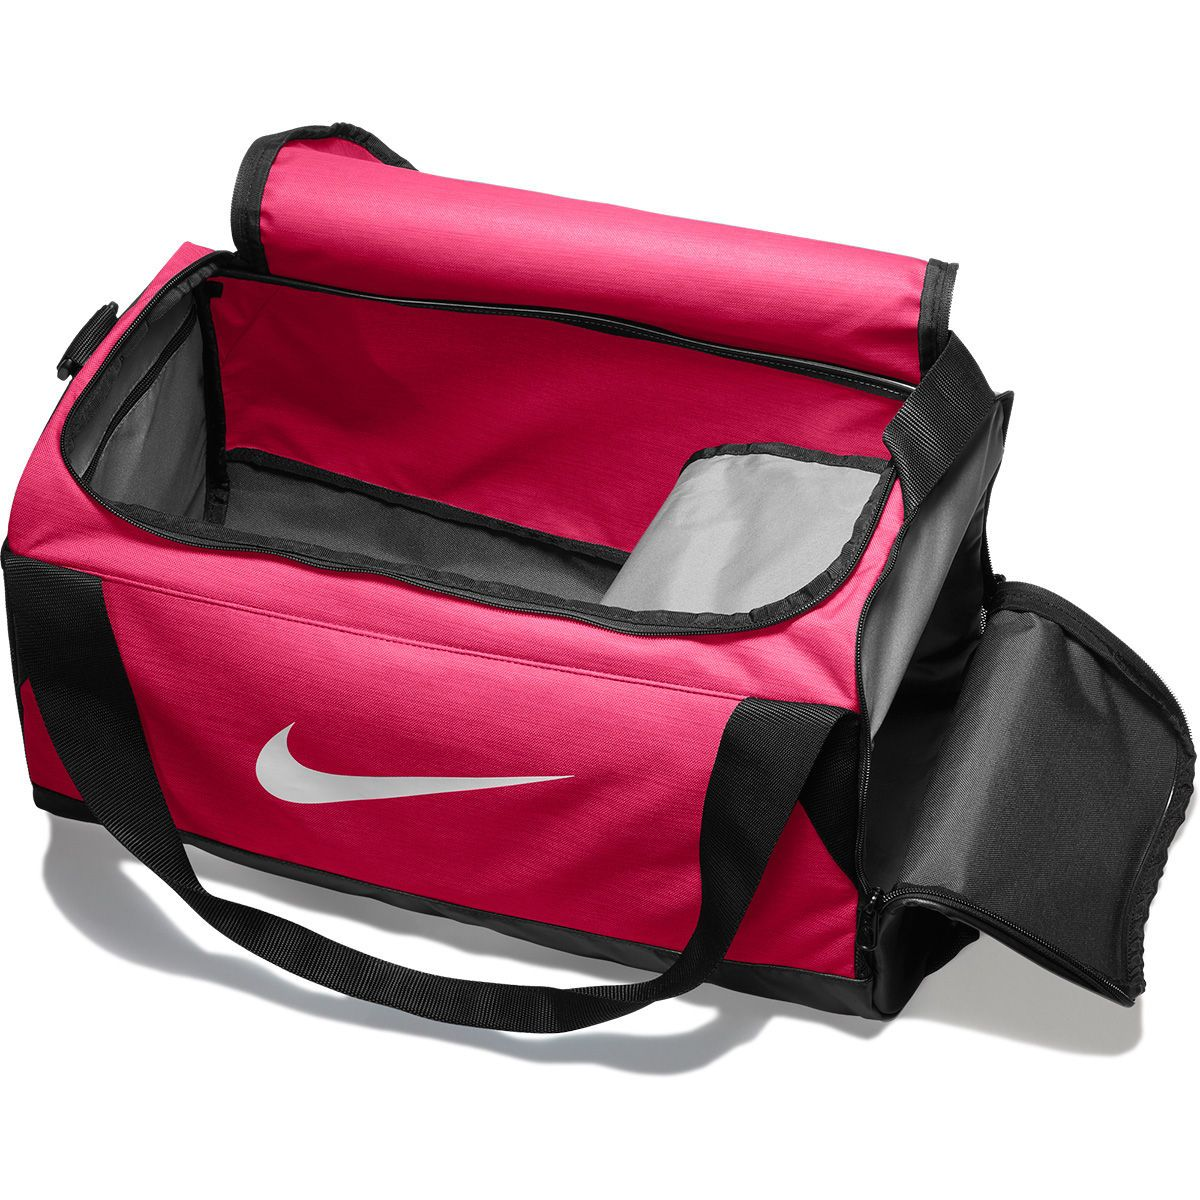 Mala Nike Brasília Duffel Pequena Masc/fem